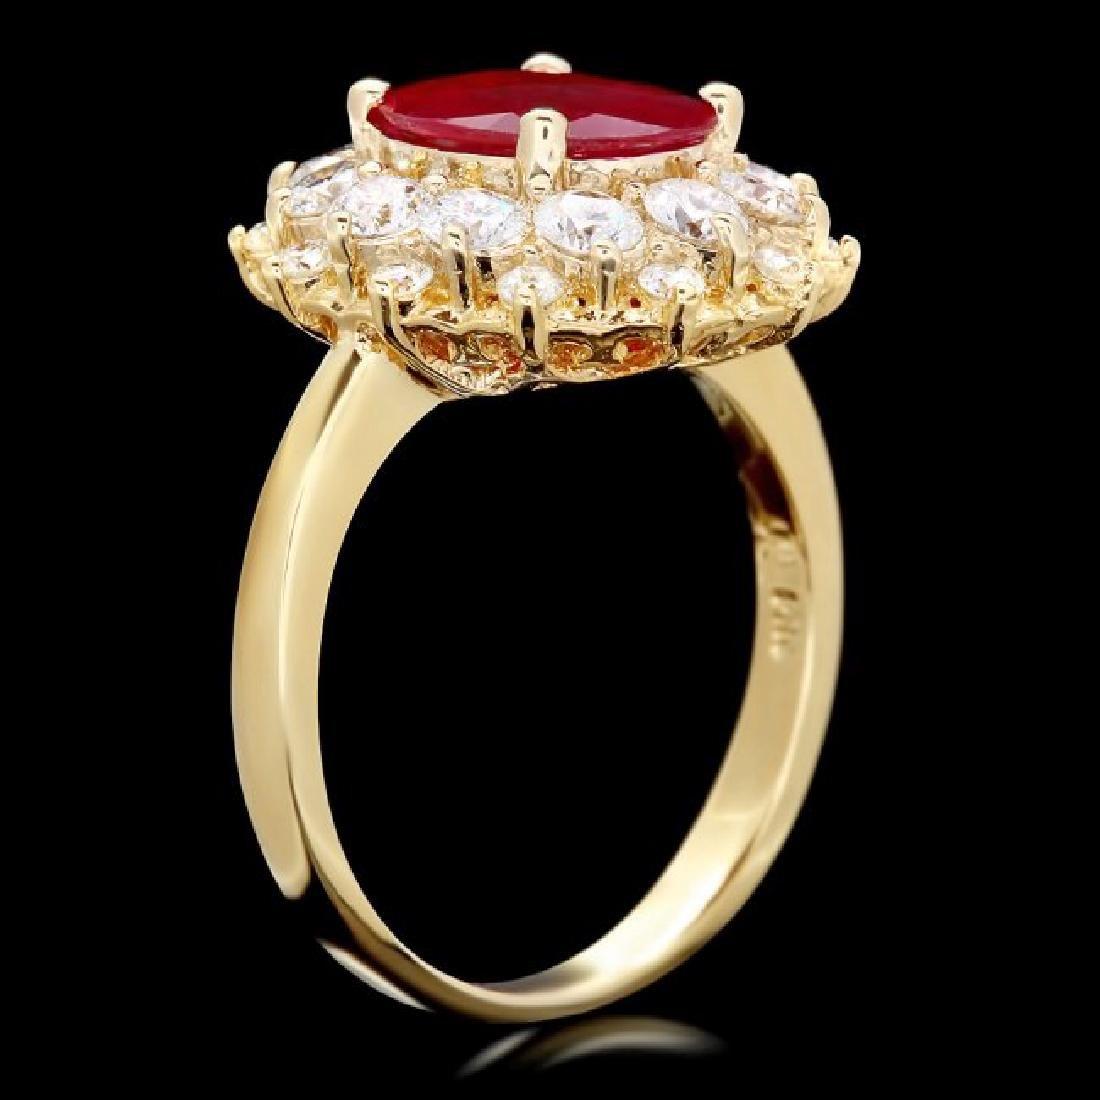 14k Yellow Gold 1.50ct Ruby 1.50ct Diamond Ring - 3